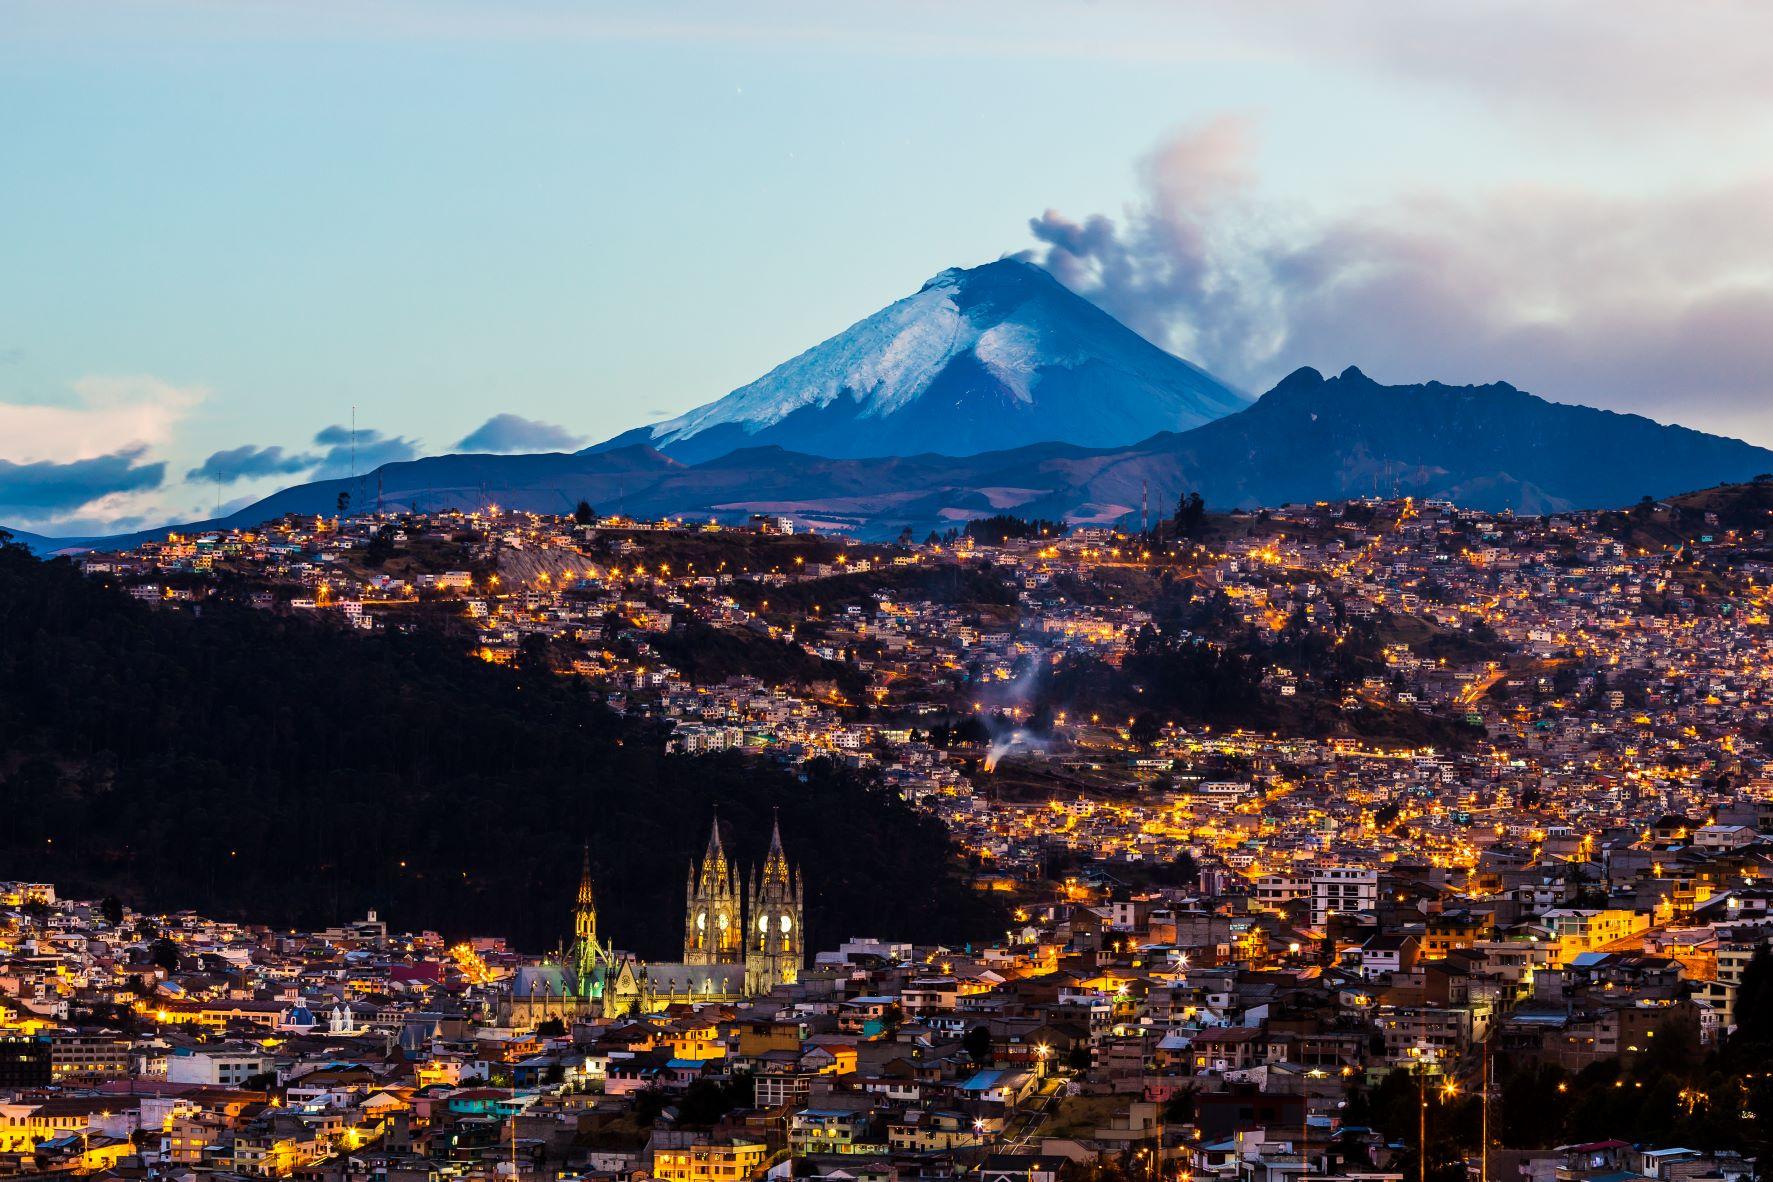 Photo of Quito at night. USTDA awarded a technical assistance grant to Quito's public transit bus operator, Empresa Pública Metropolitana de Transporte de Pasajeros de Quito (EPMTPQ), to help modernize its bus fleet and expand related intelligent transportation system technologies in Quito.